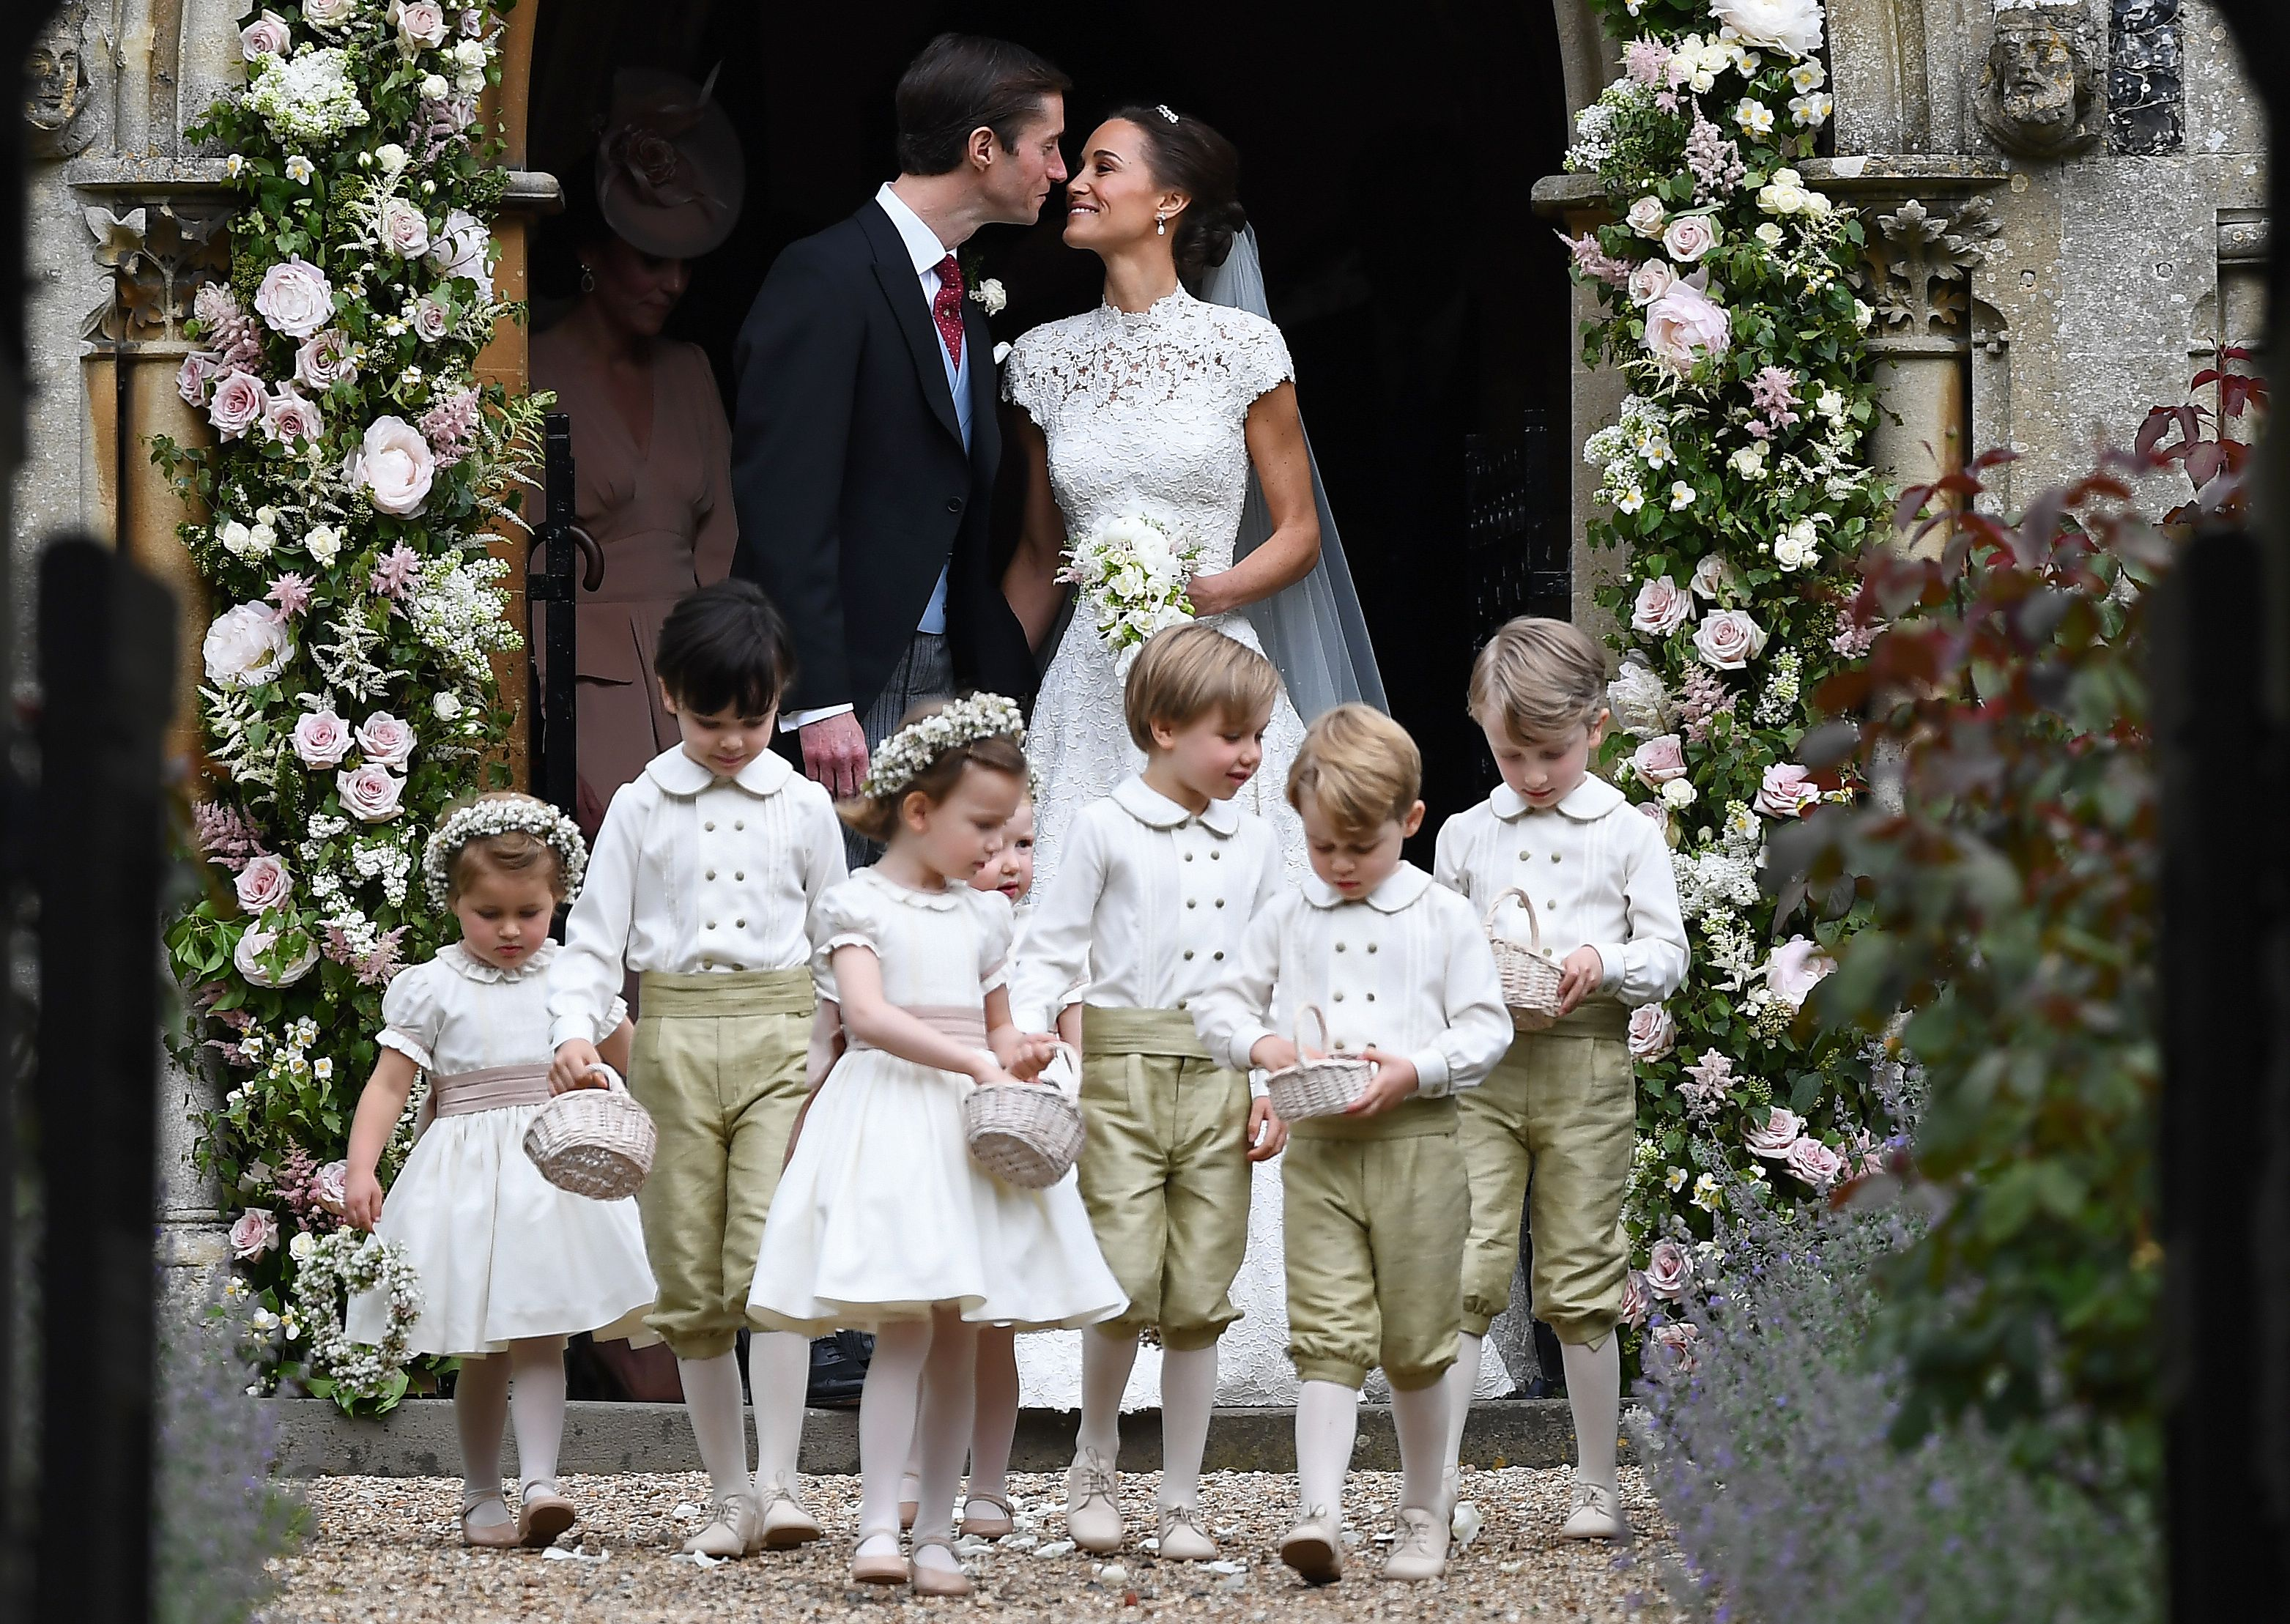 TOPSHOT-BRITAIN-ROYALS-PEOPLE-MIDDLETON-MARRIAGE